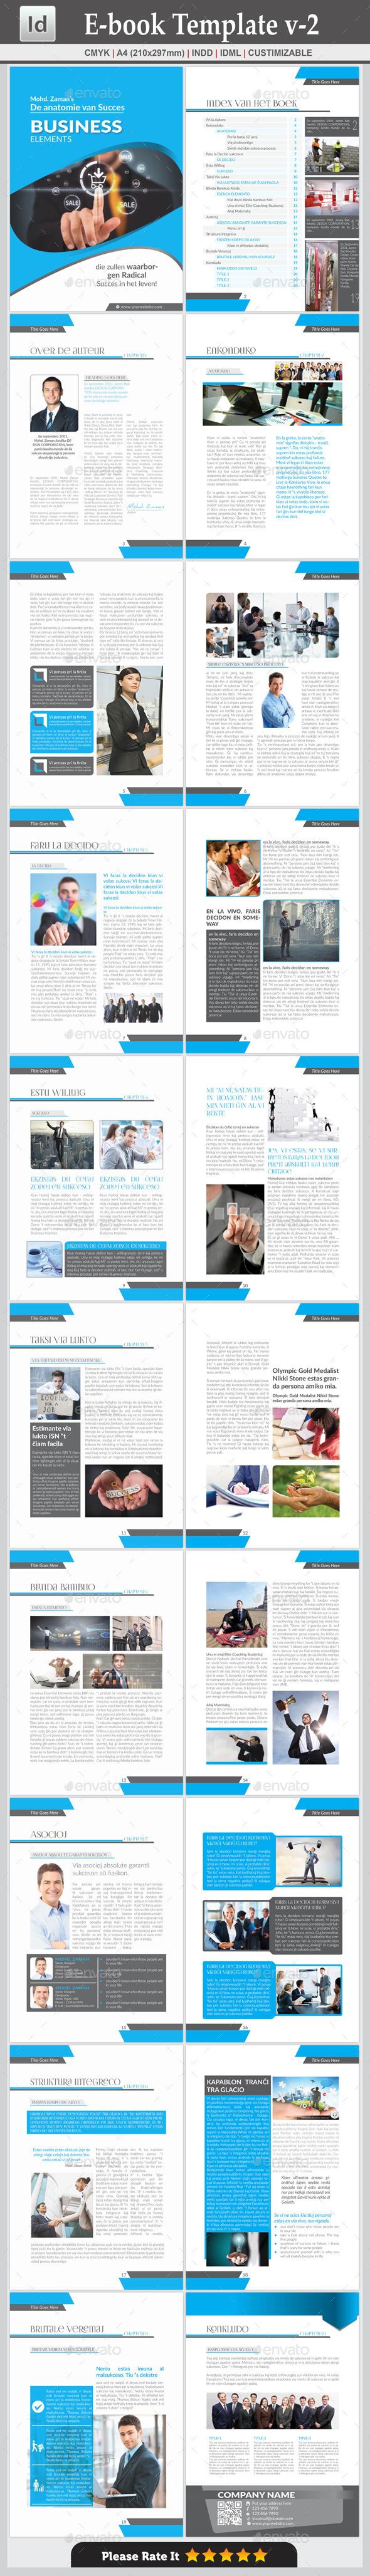 E-book Template v-2 - Digital Books ePublishing